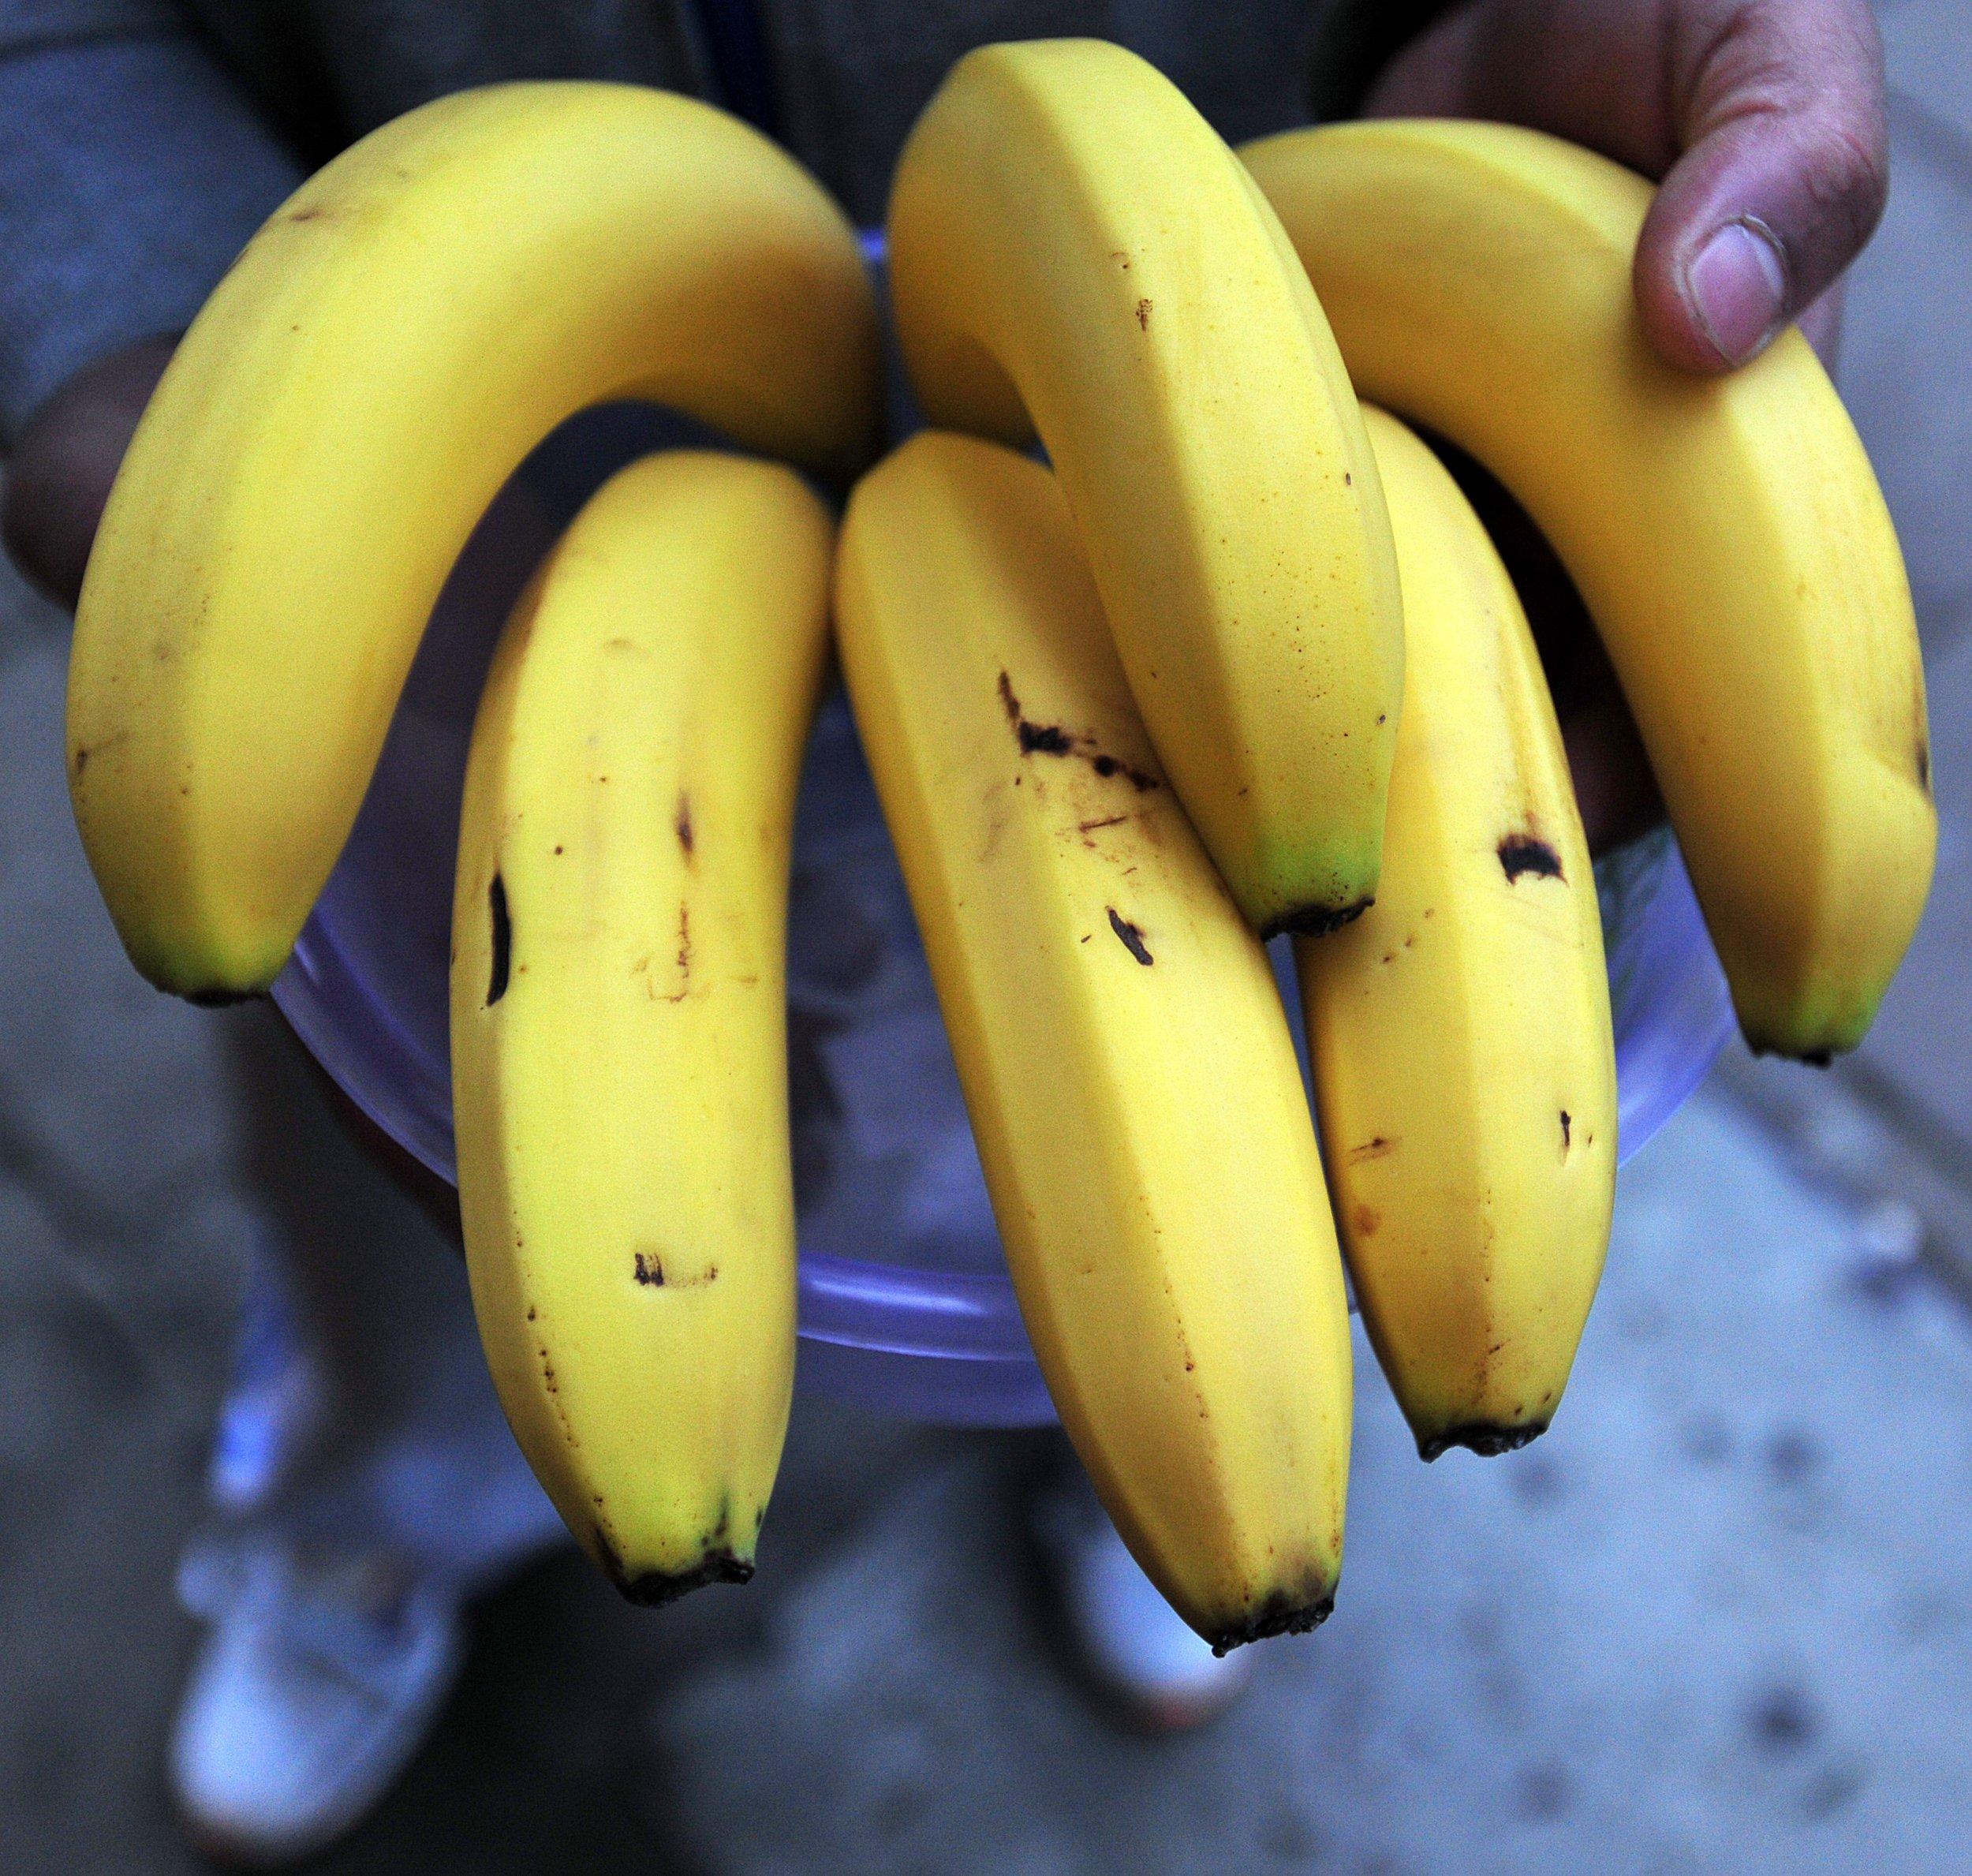 Britons Throw Away 160 Million Bananas Annually Report